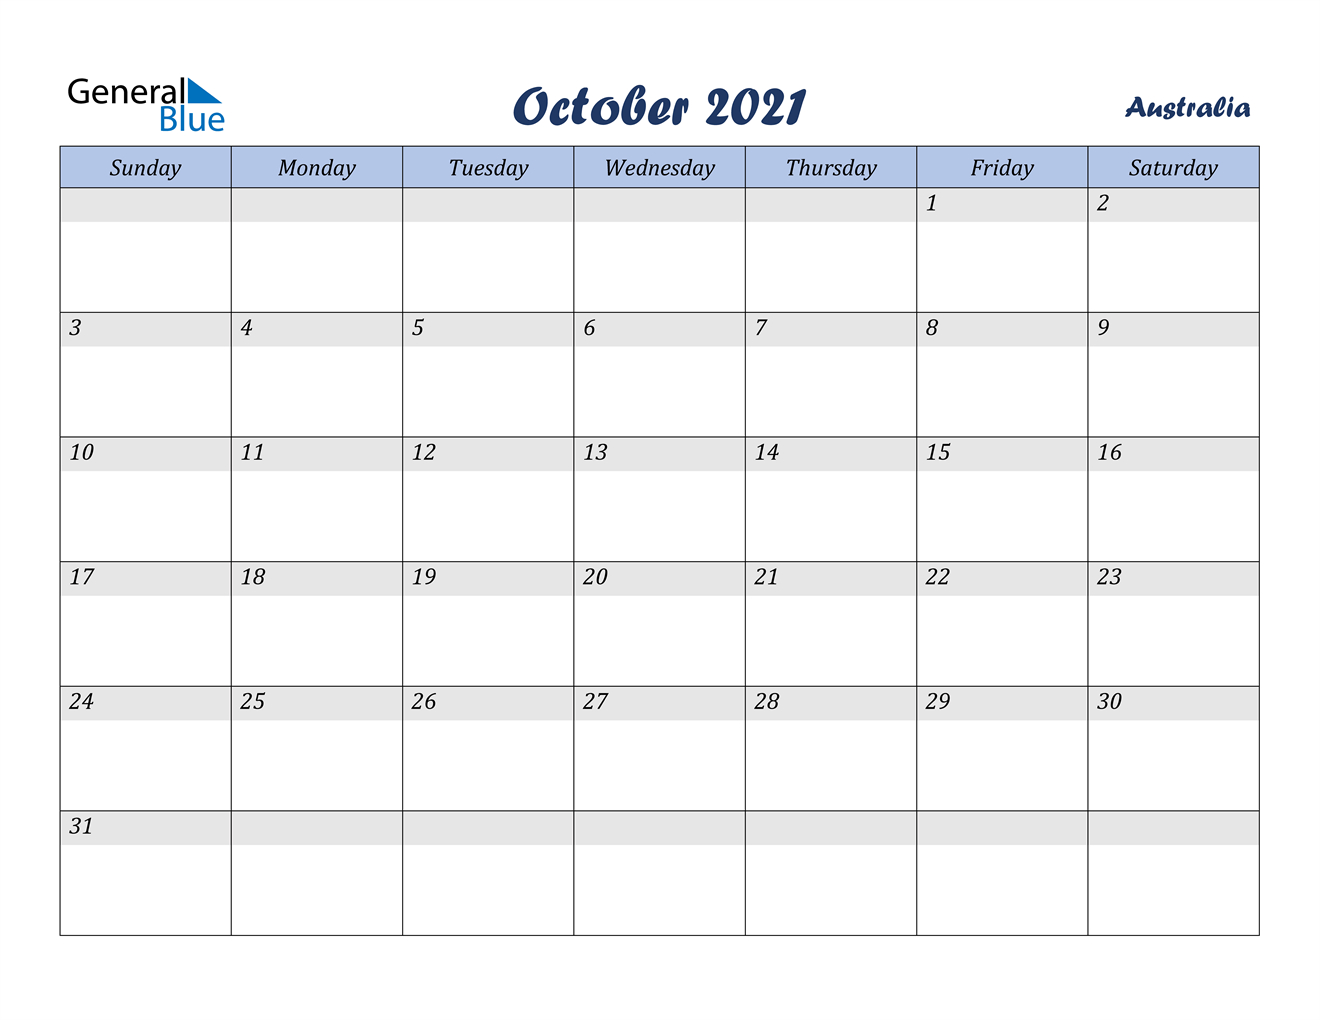 October 2021 Calendar - Australia